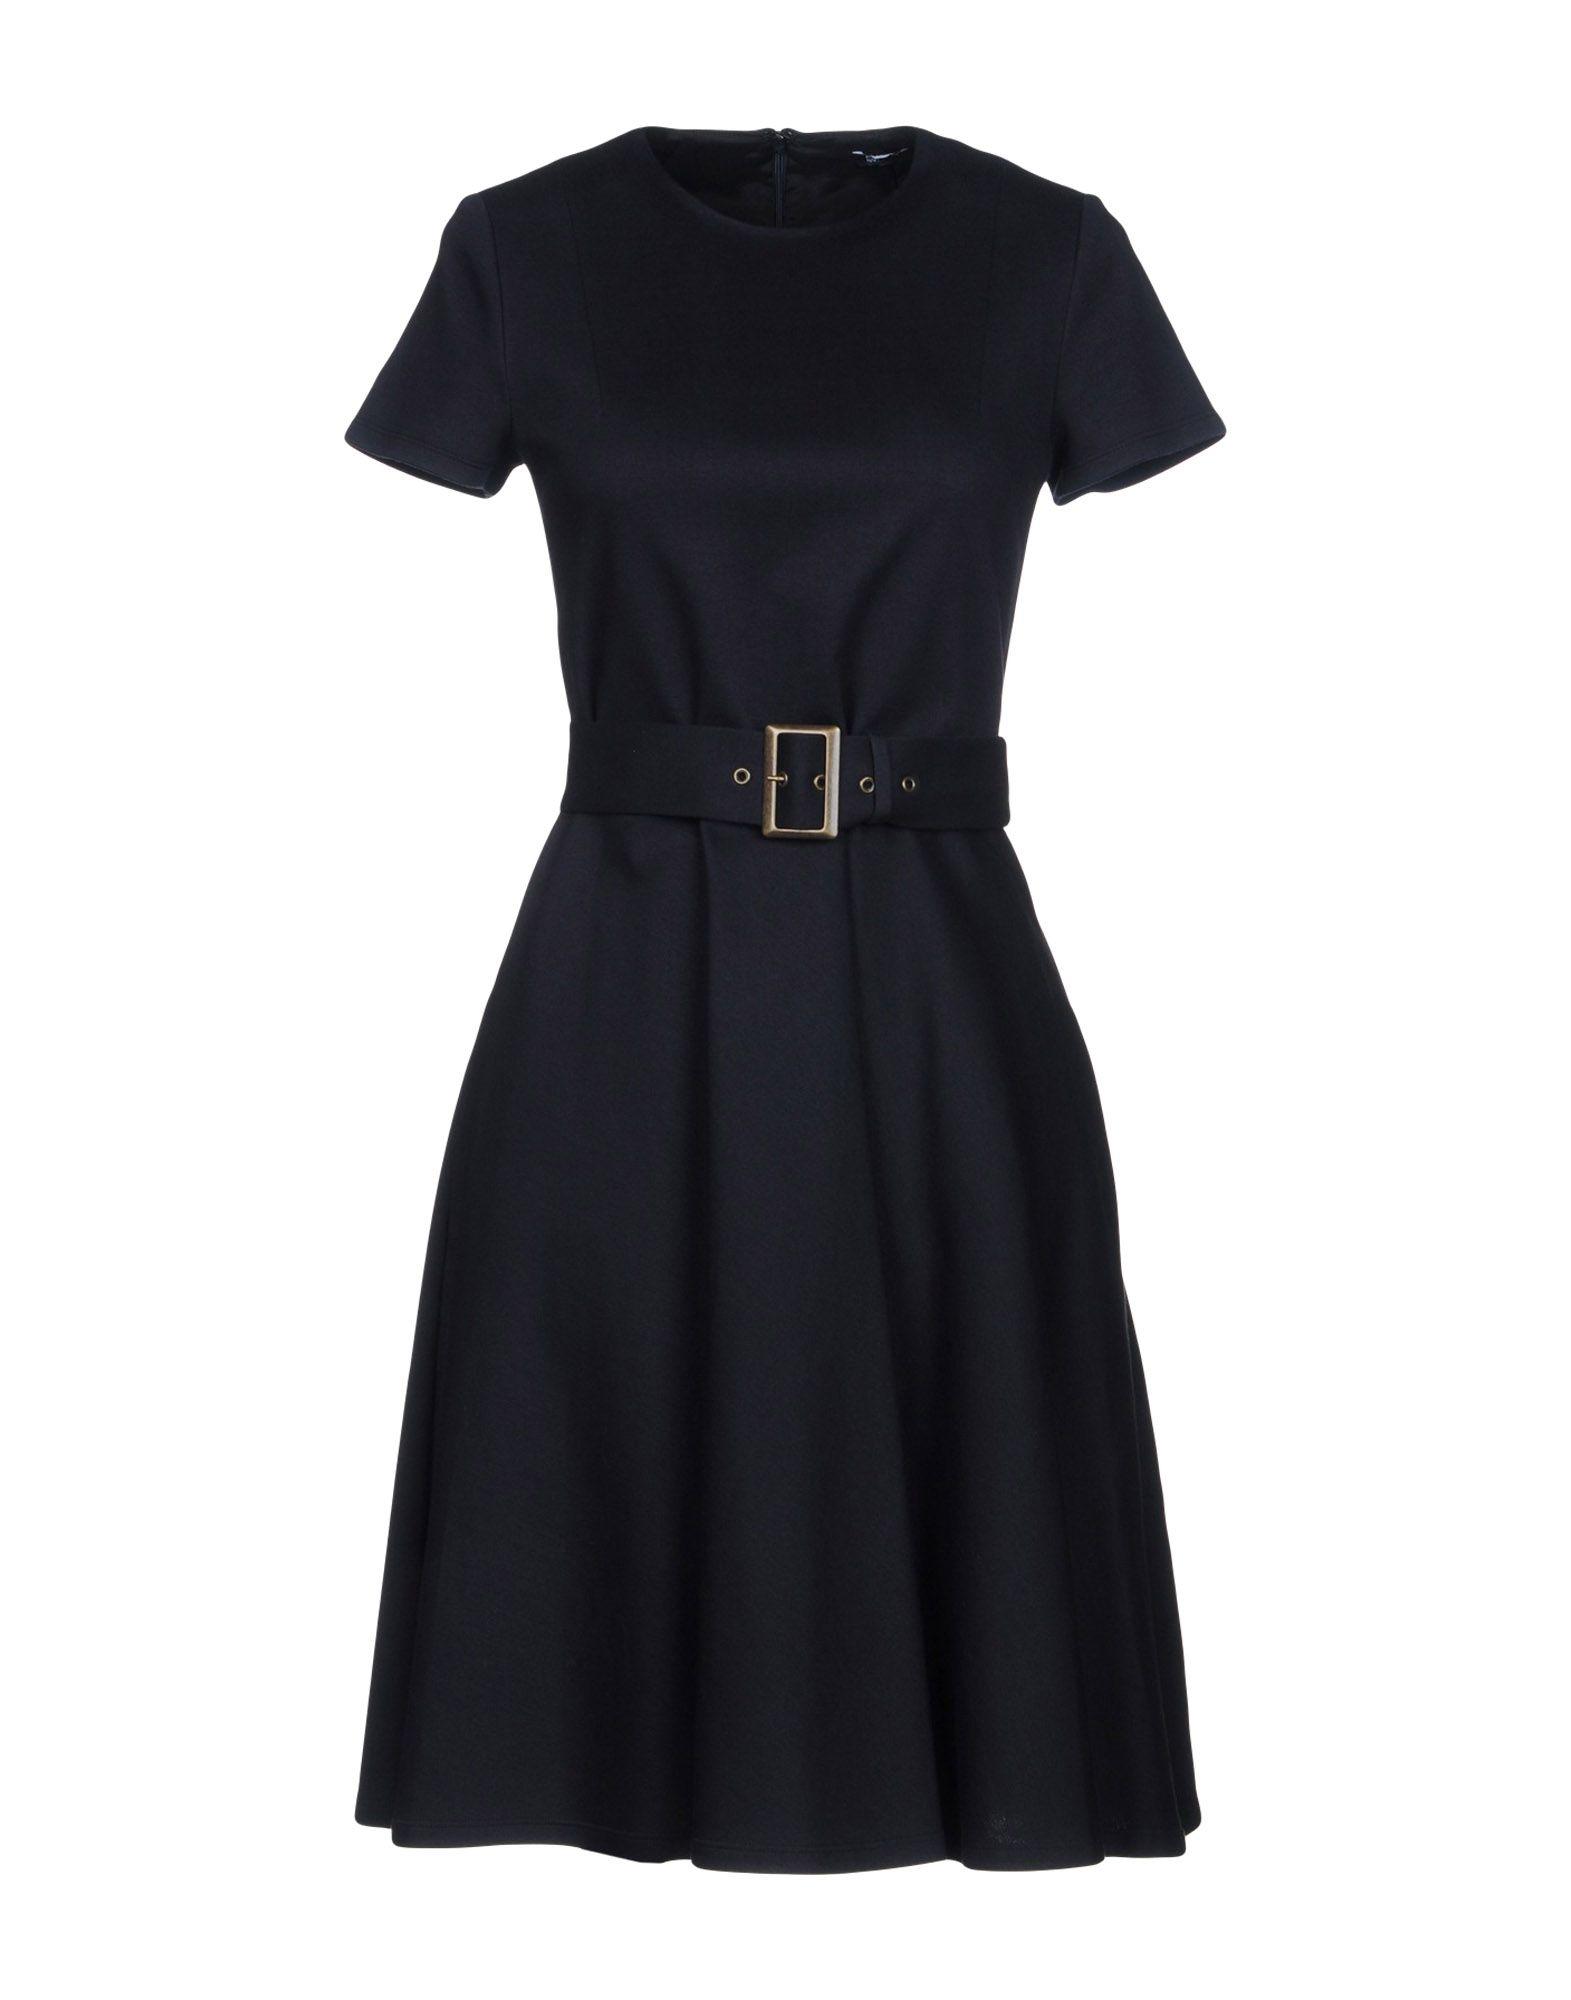 Vestito Corto Jil Sander Navy Donna - Acquista online su tKphOez5